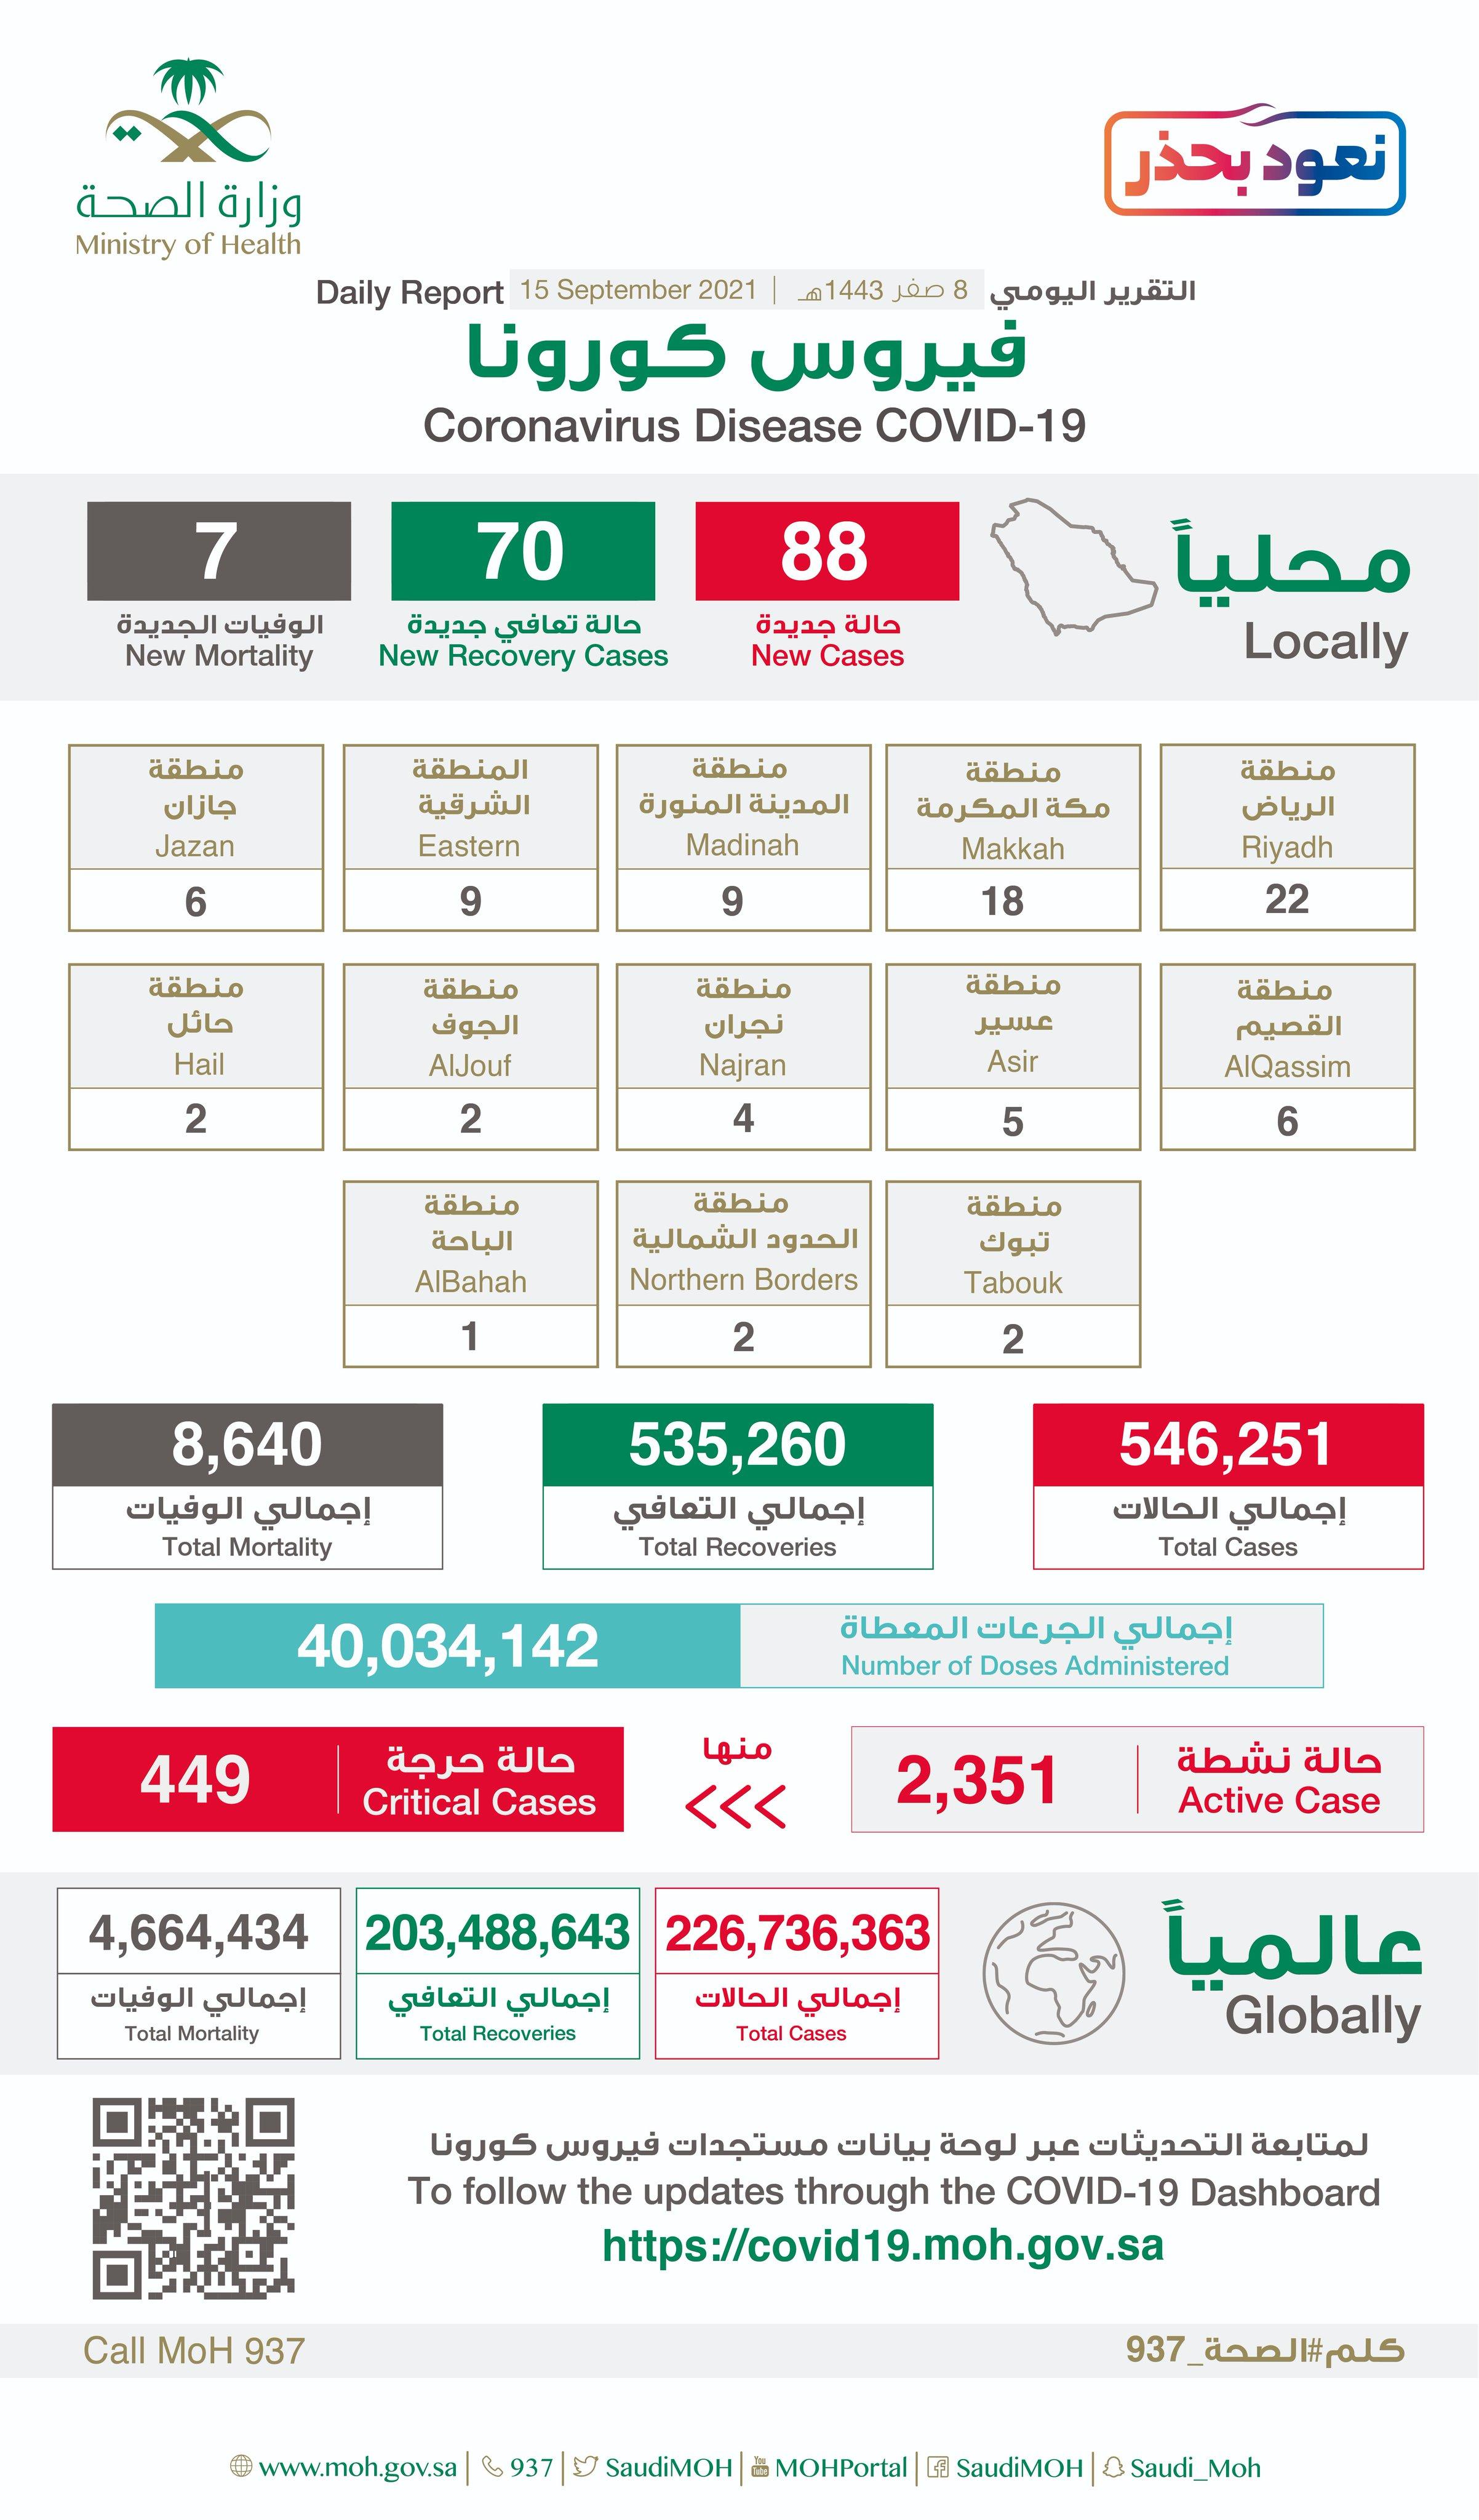 Saudi Arabia Coronavirus : Total Cases : 546,251 , New Cases : 88, Cured : 535,260 , Deaths: 8,640, Active Cases : 2,351